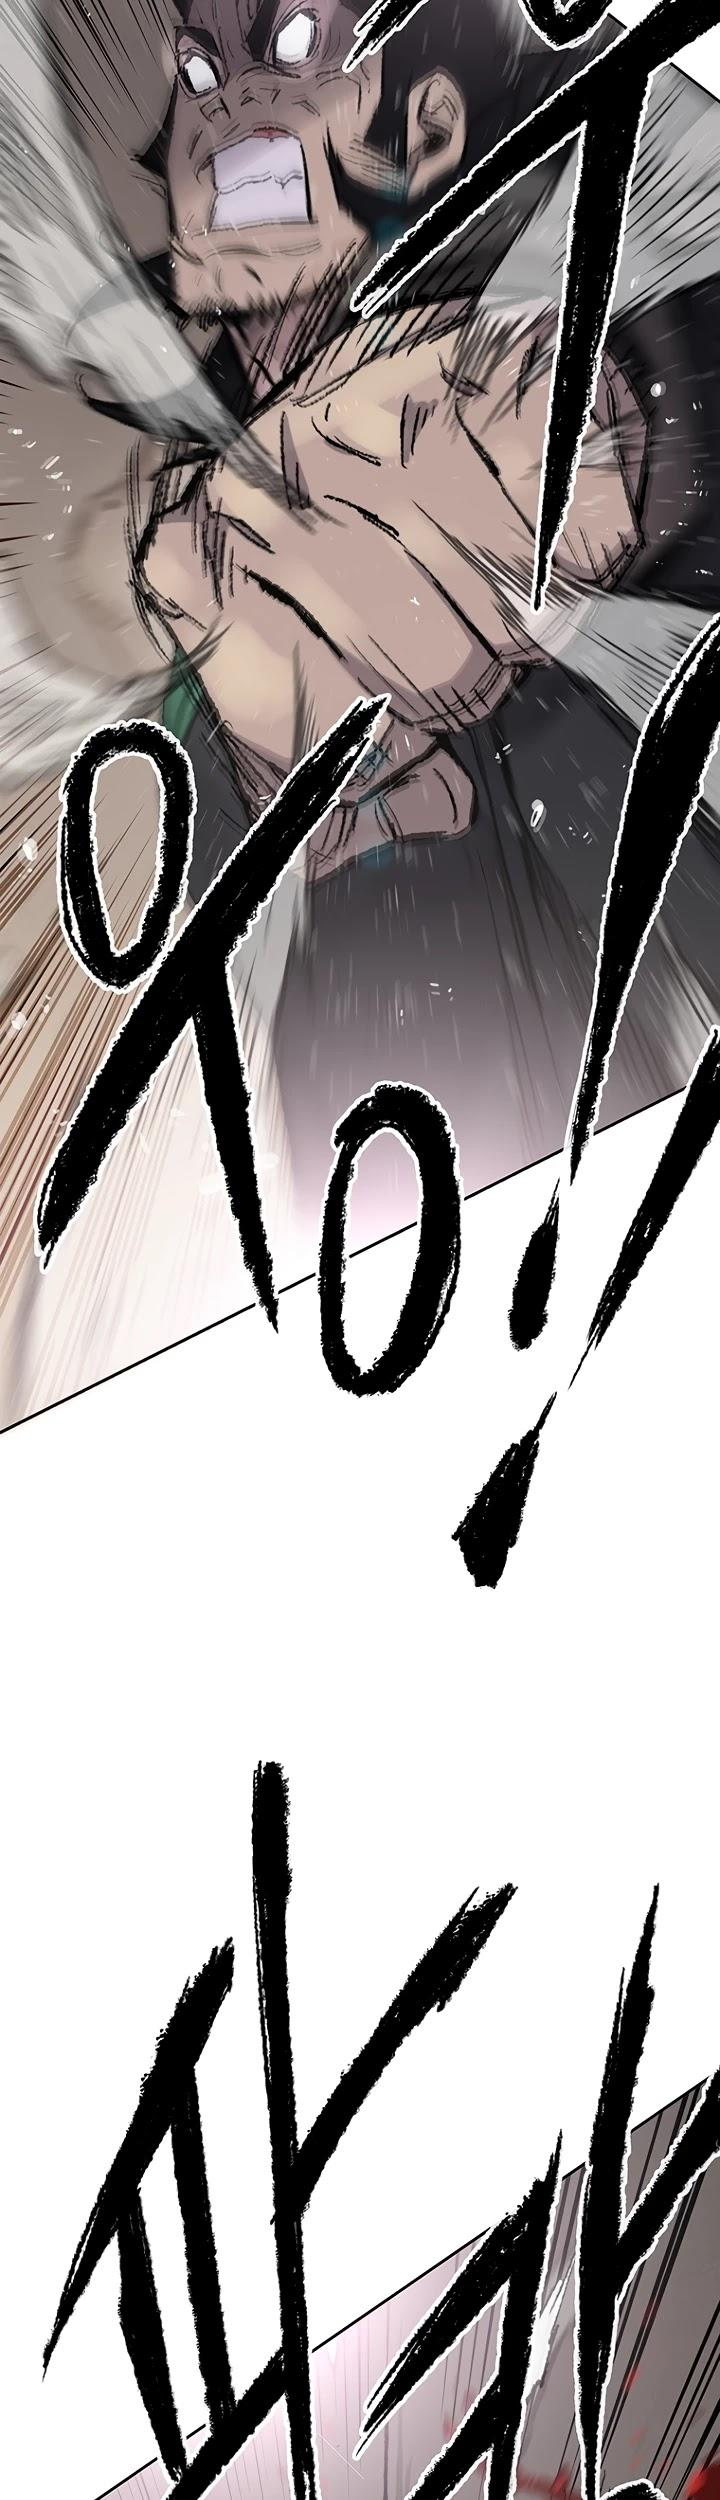 The Undefeatable Swordsman Chapter 73 page 17 - Mangakakalots.com